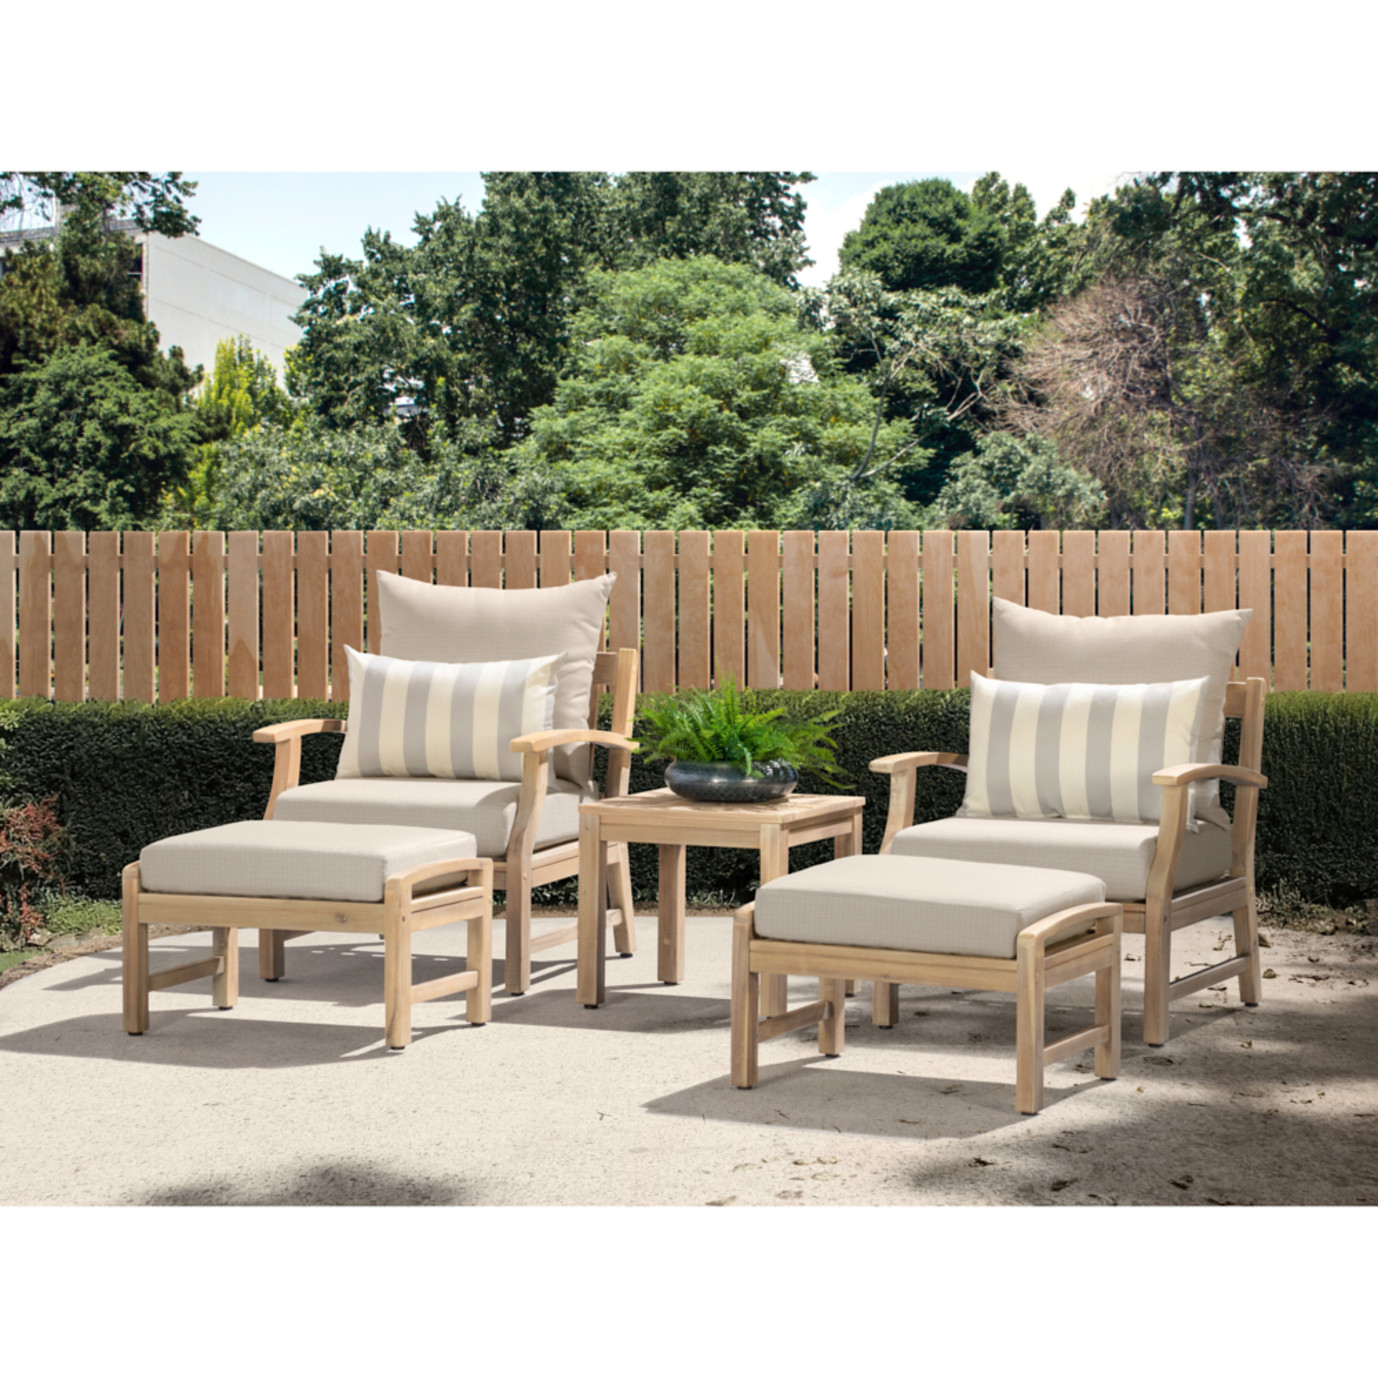 Kooper 5pc Club Chair & Ottoman Set - Slate Gray